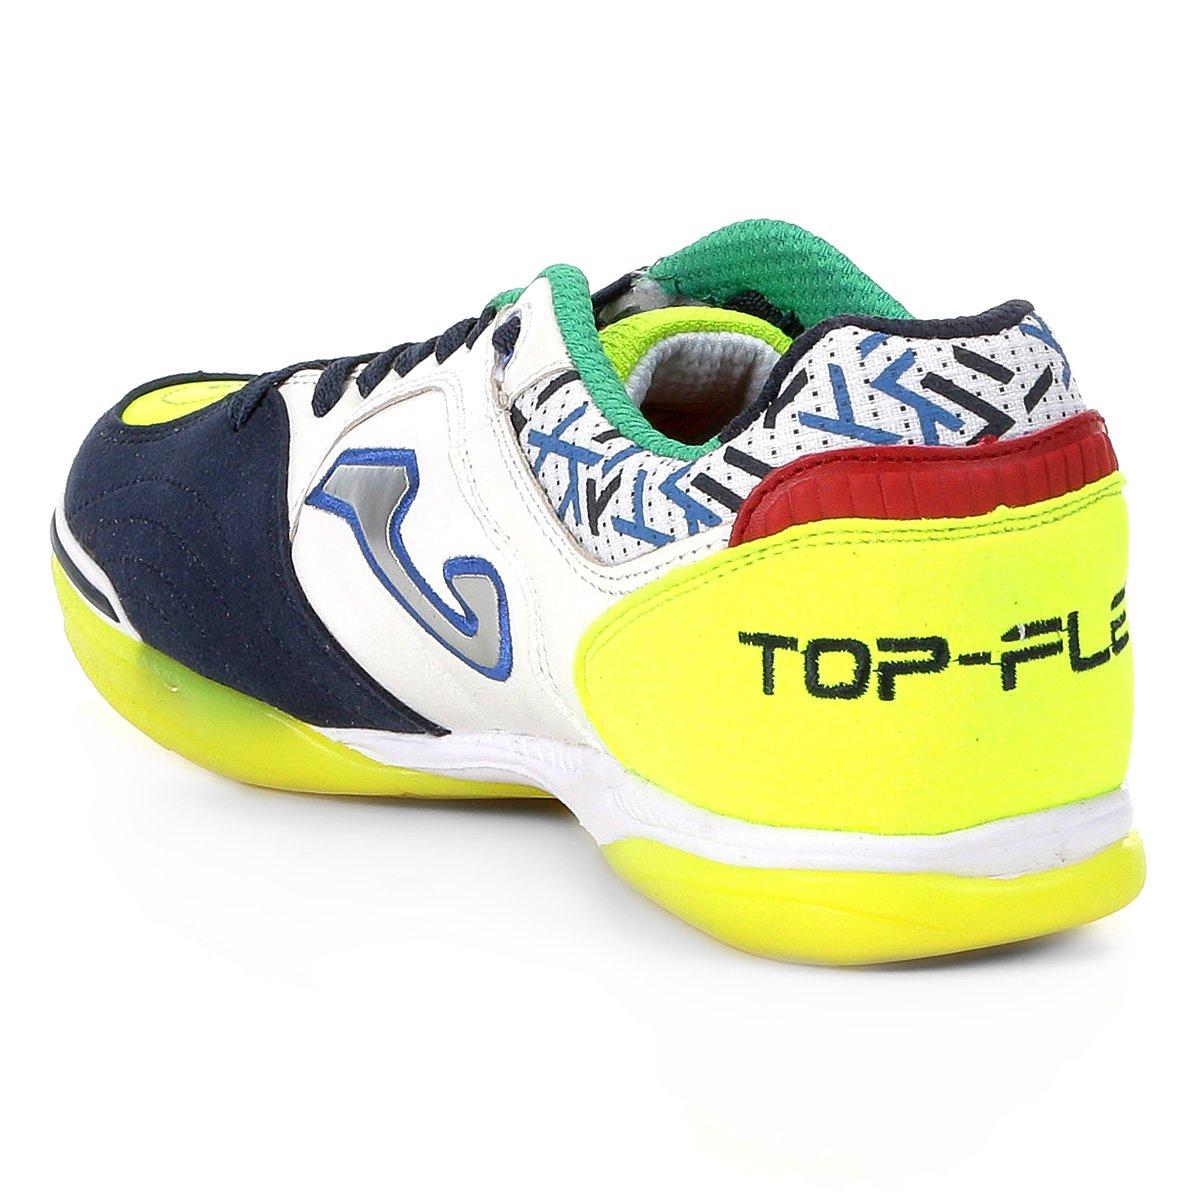 Chuteira Joma IN Futsal Masculina Flex e Branco Verde Top BrSBqwP